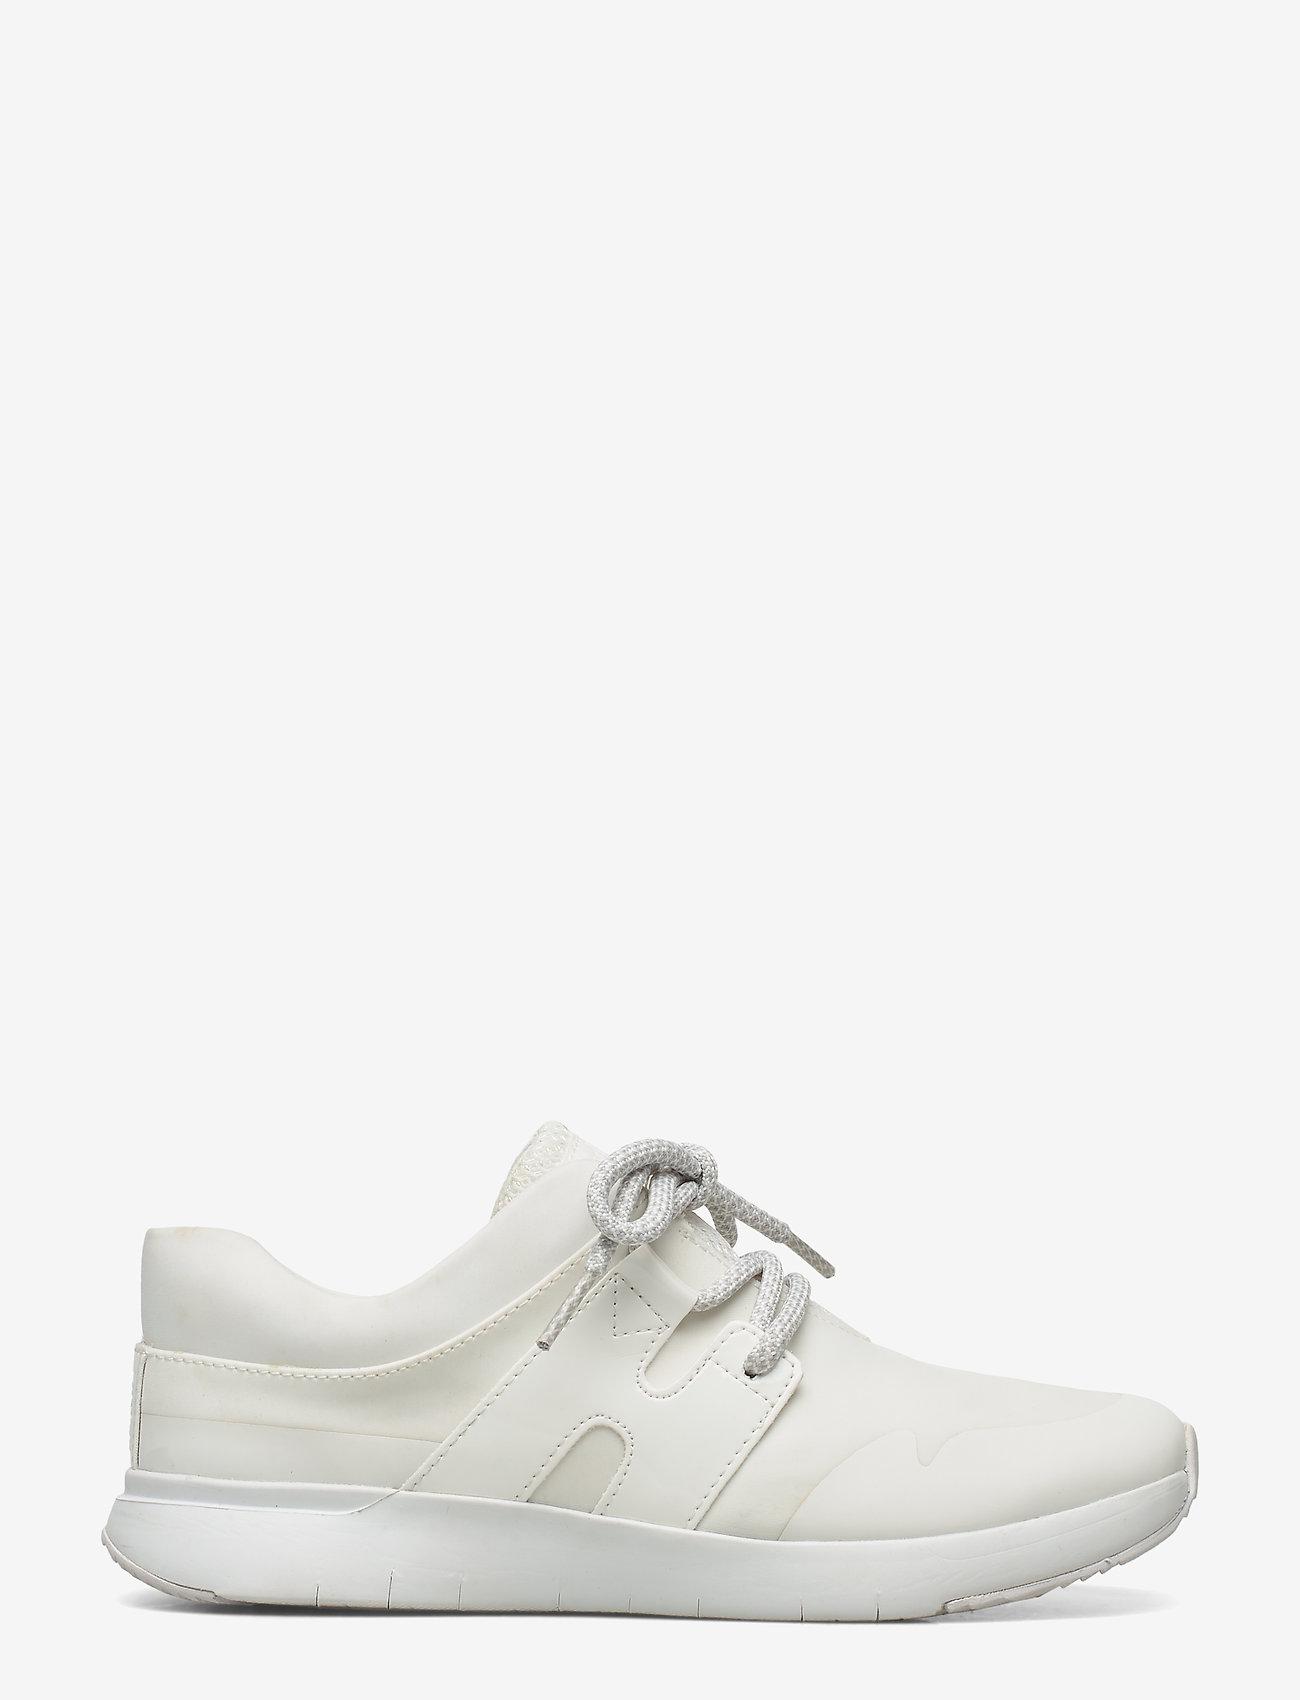 Anni Flex Sneakers (Urban White) - FitFlop M0YihQ